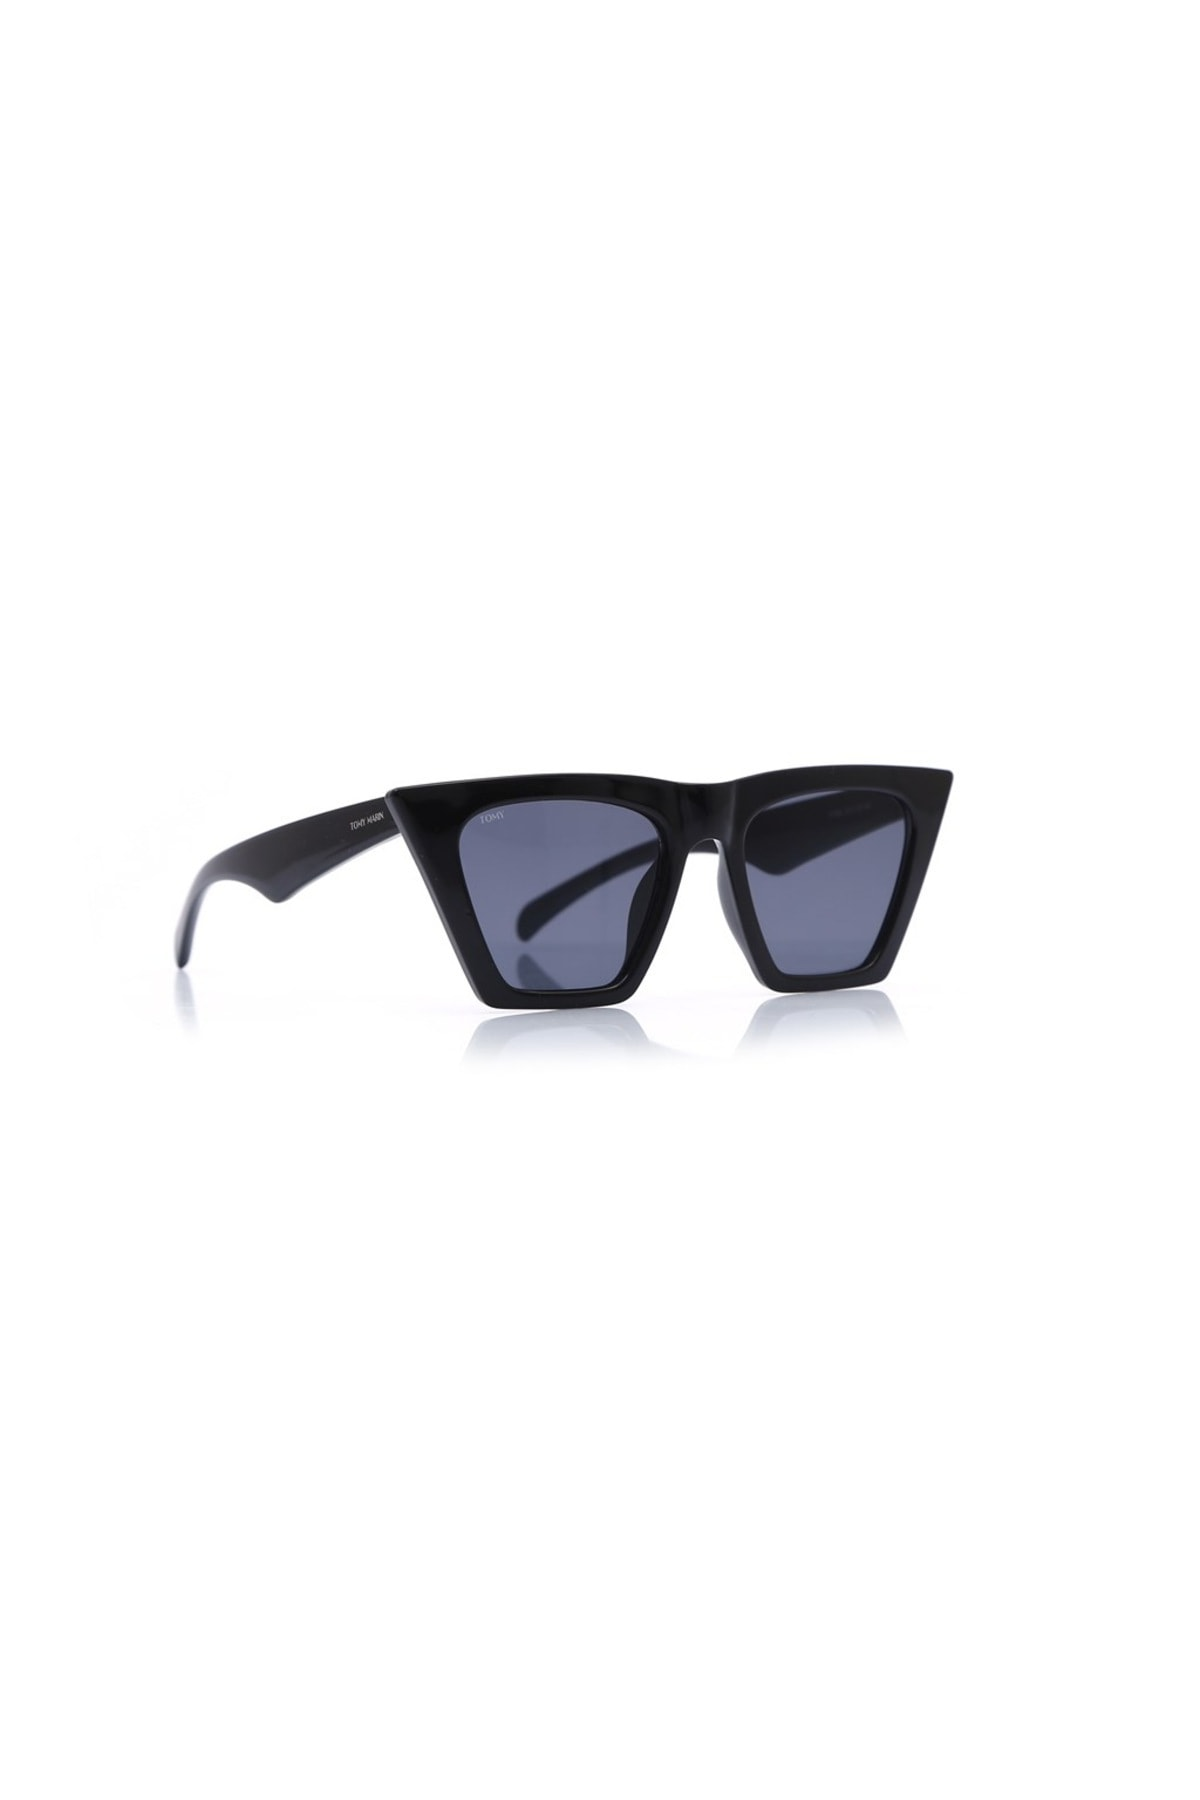 خرید پستی عینک آفتابی شیک زنانه برند Tomy Marin رنگ مشکی کد ty36869760